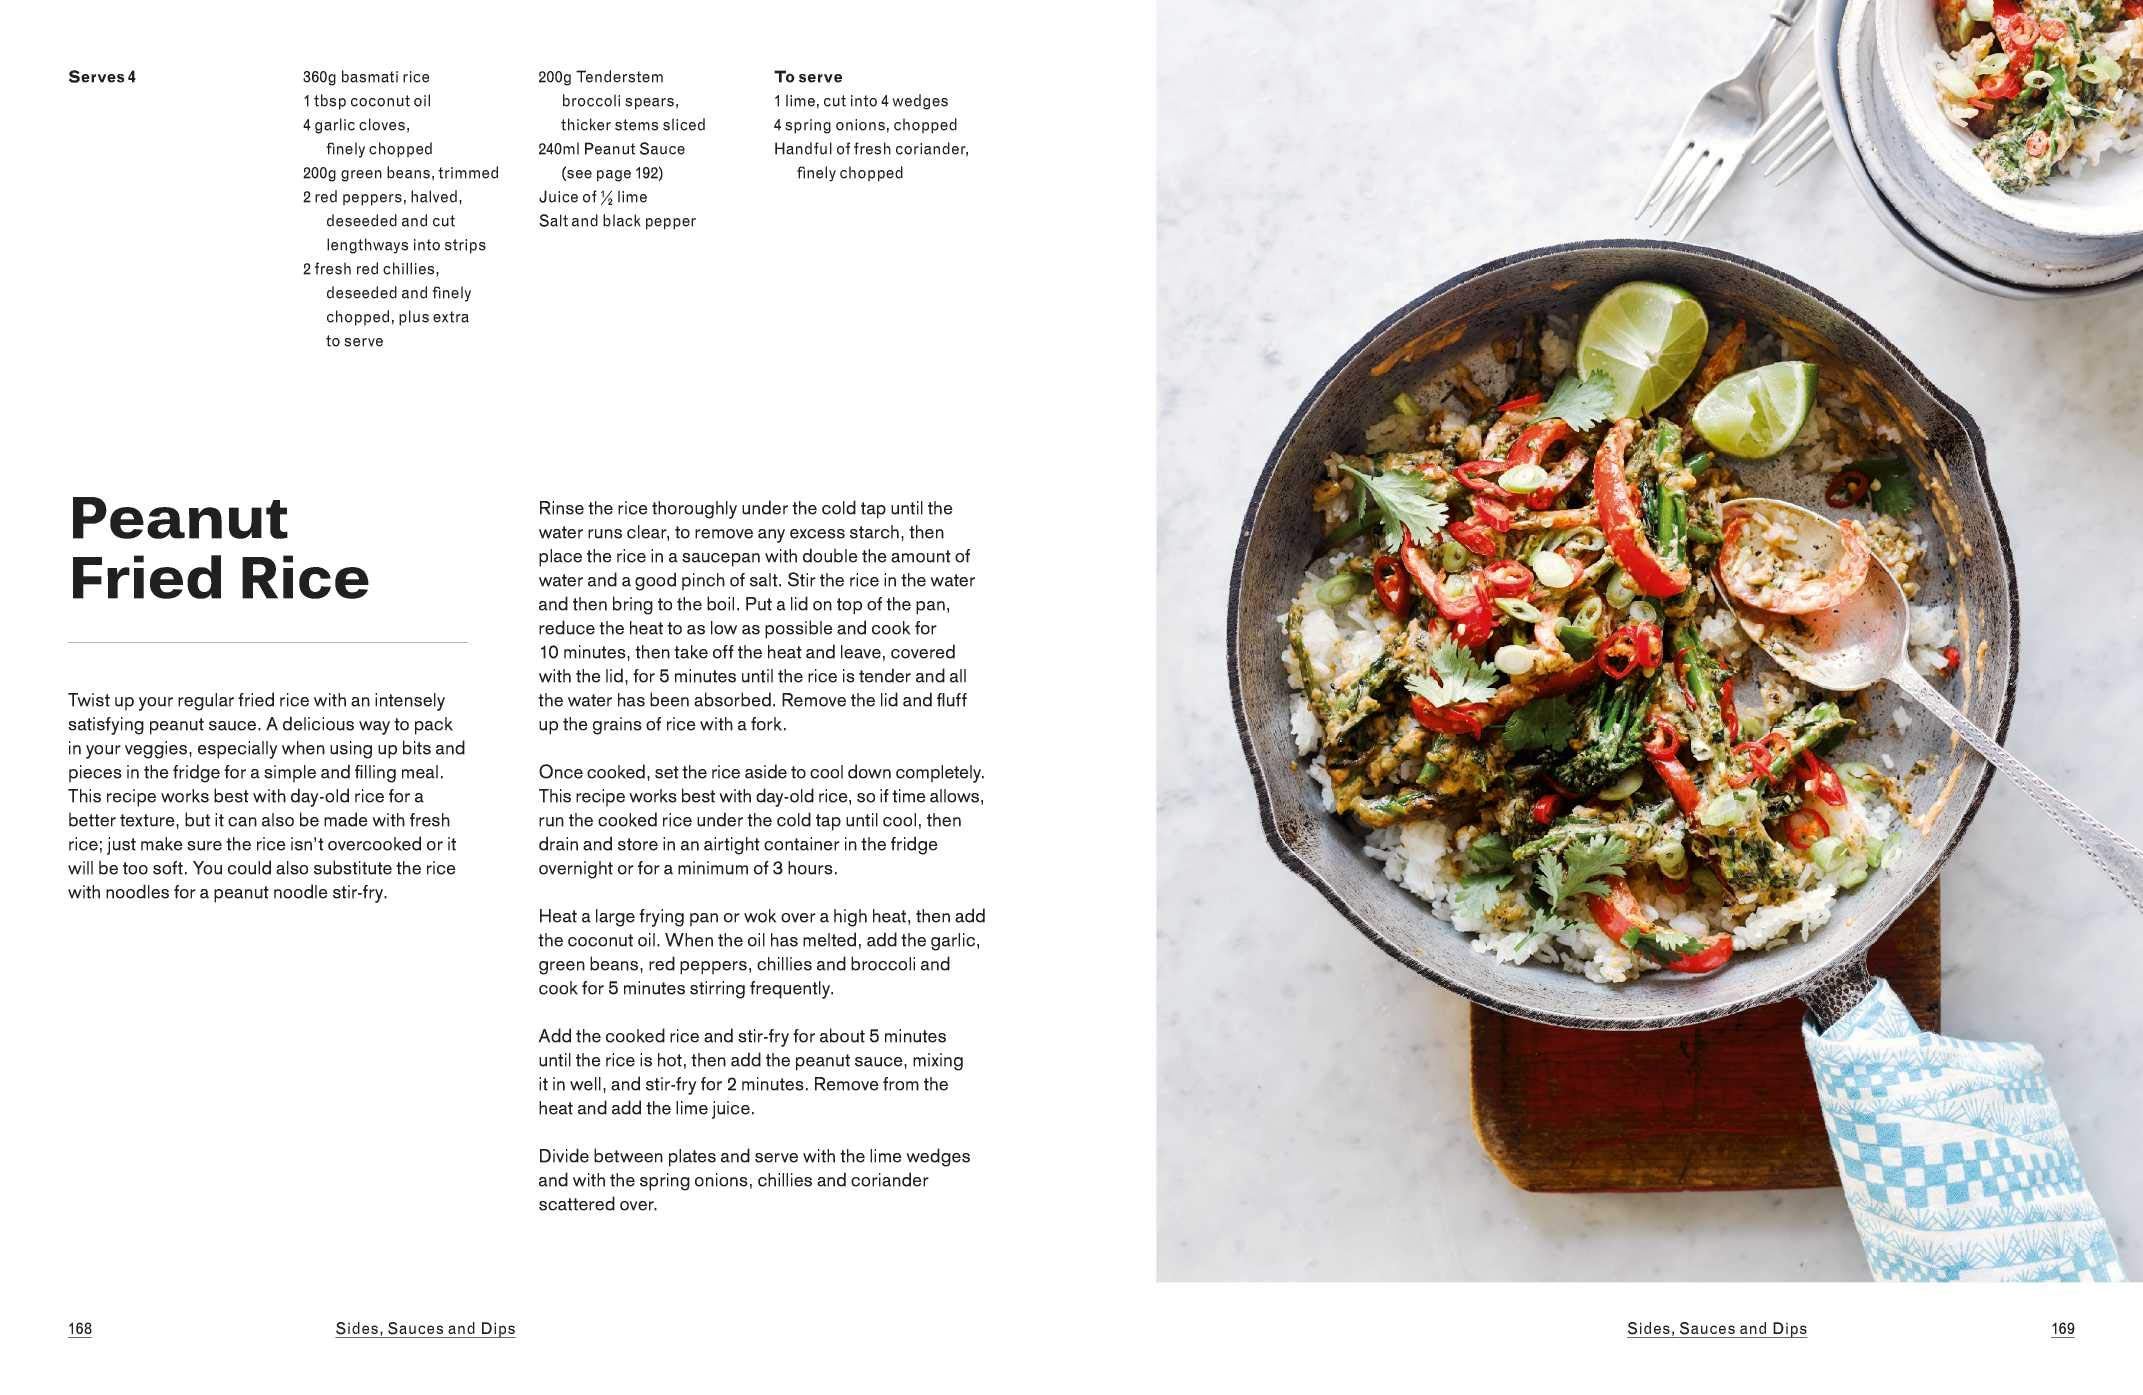 Rachel Ama's Vegan Eats: Tasty plant-based recipes for every day 9